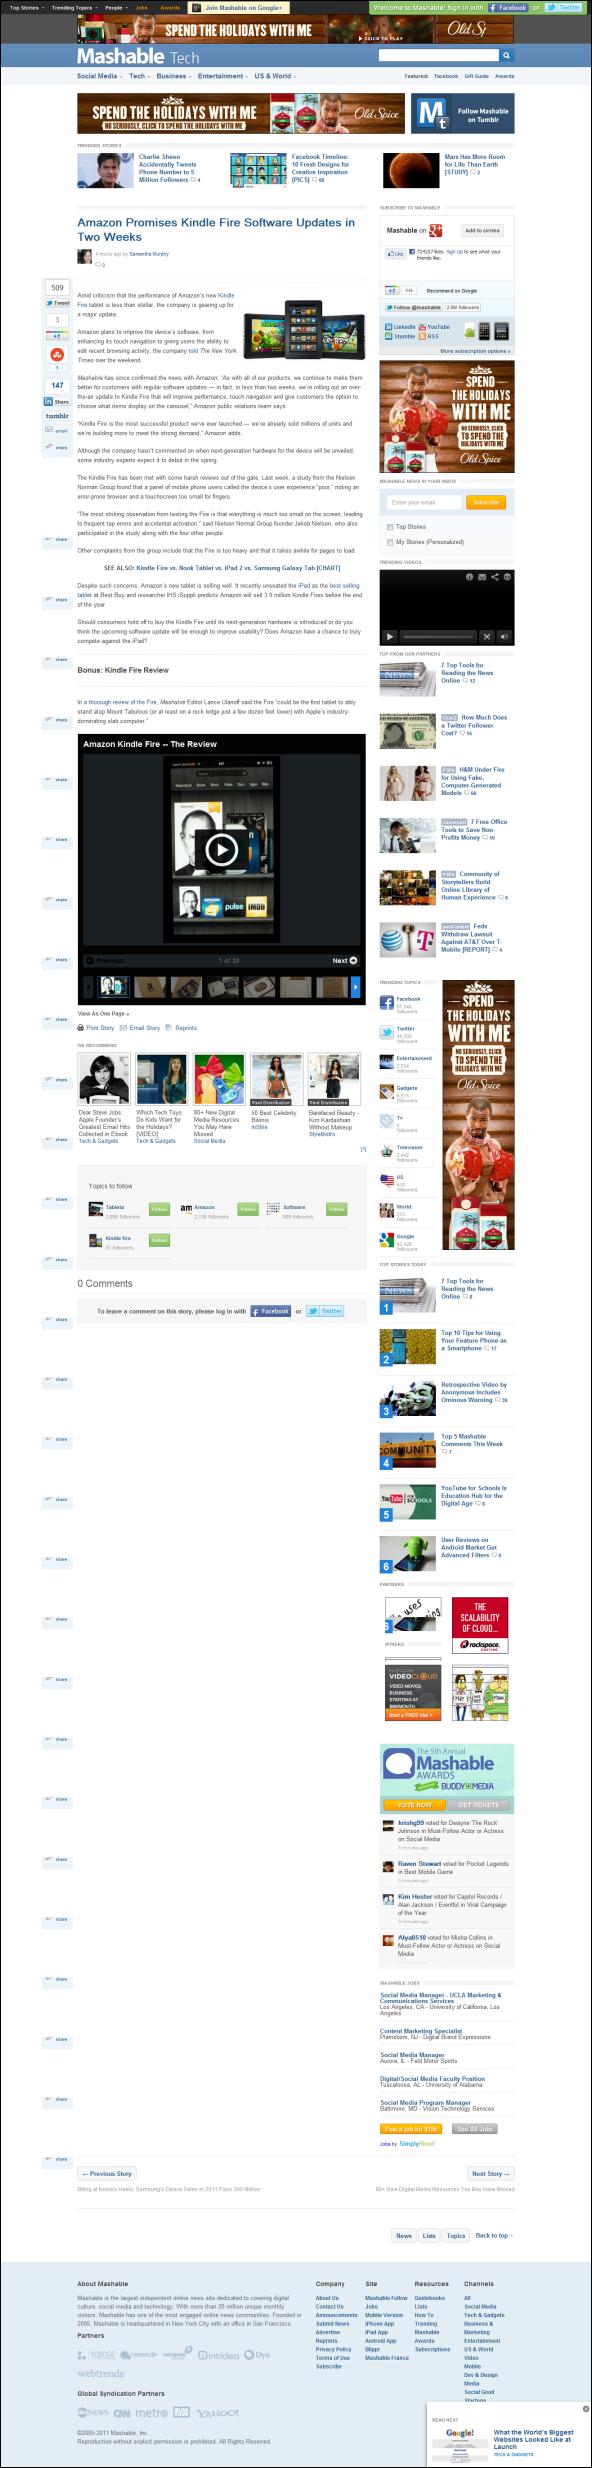 mashable page